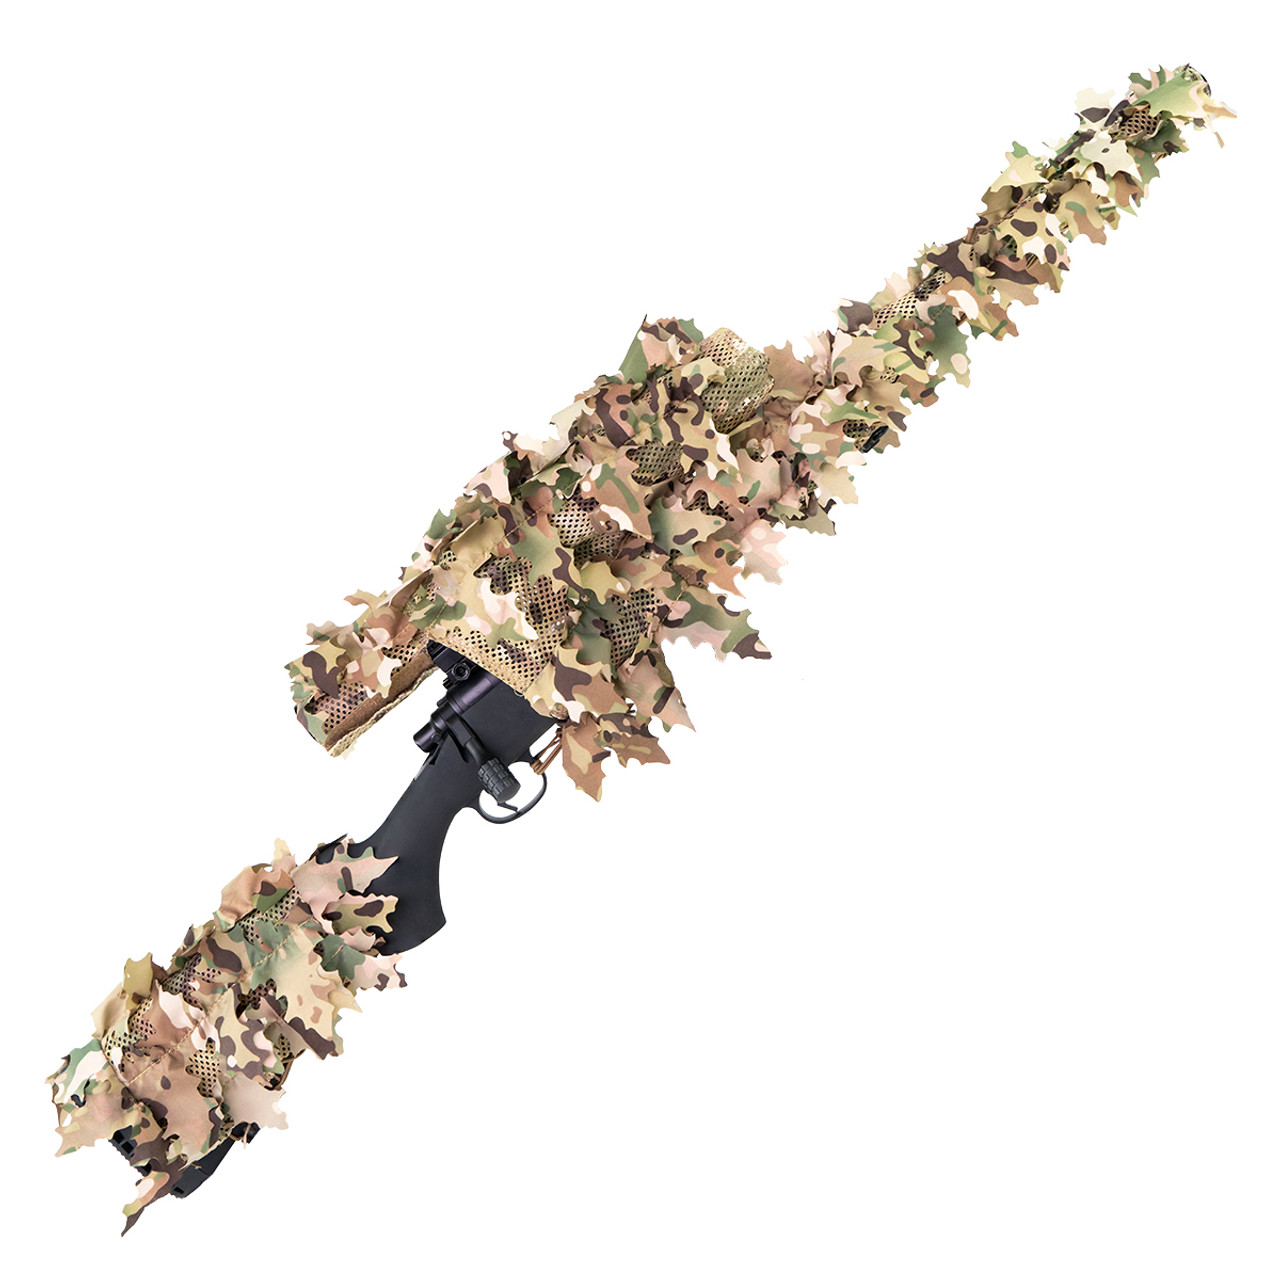 NOVRITSCH Classic Sniper Rifle Multicam 3D Camo Cover